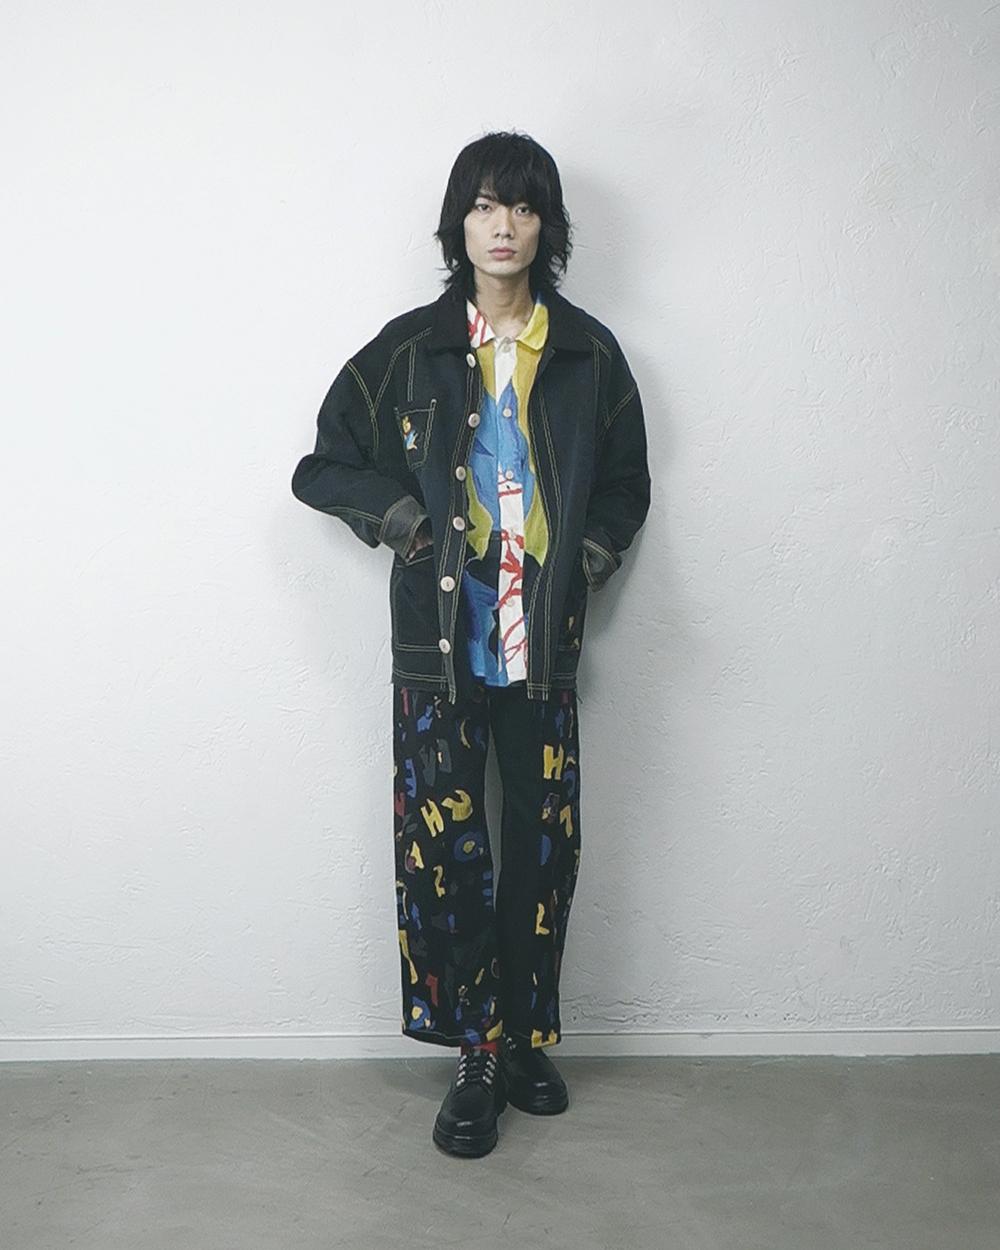 Ron Wan for JOYCE Spot Hong Kong Featuring Bethany Williams Menswear